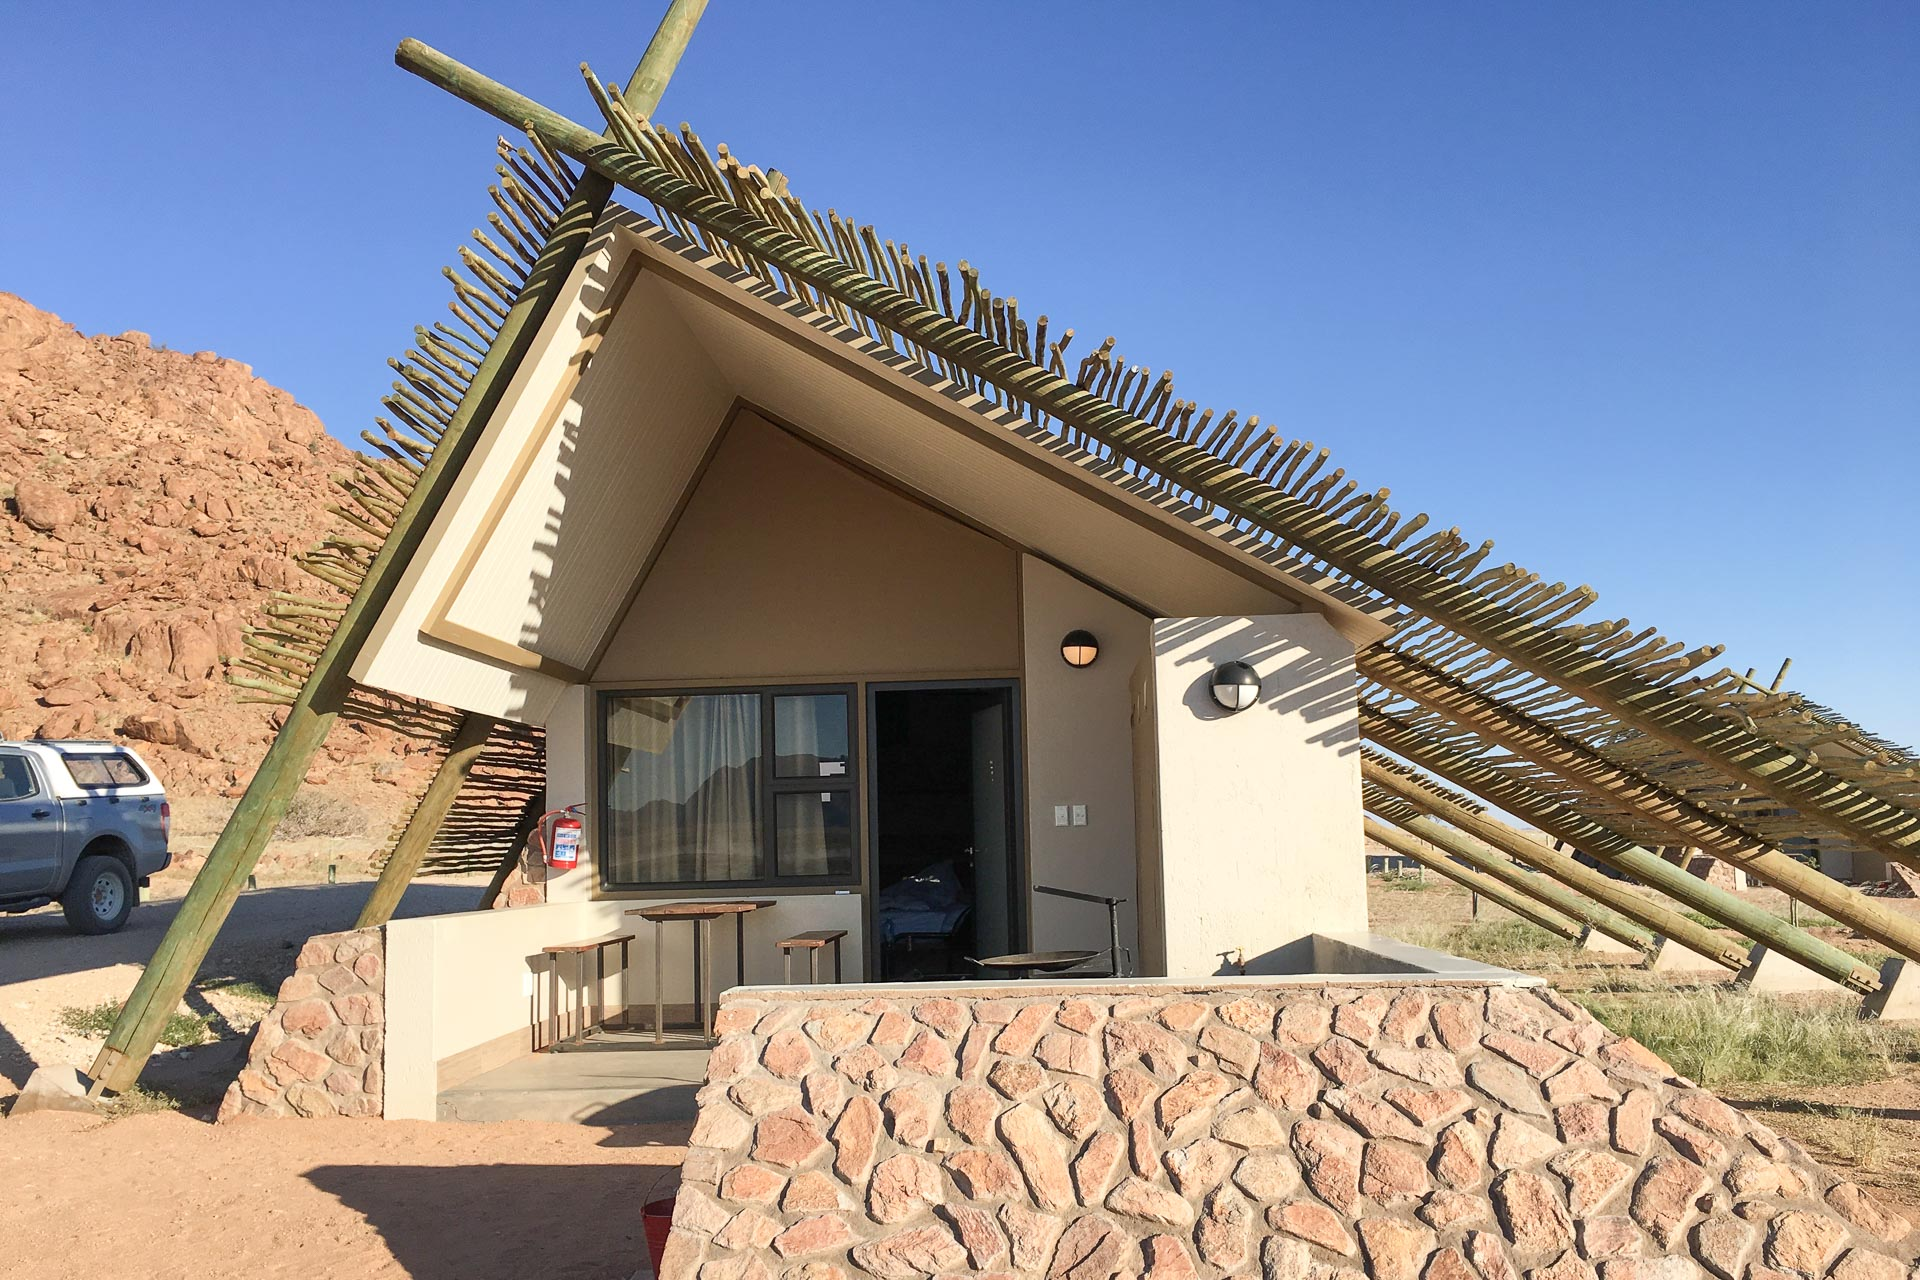 Desert-Quiver-Camp-Namibia-Globetrotter-Select-12